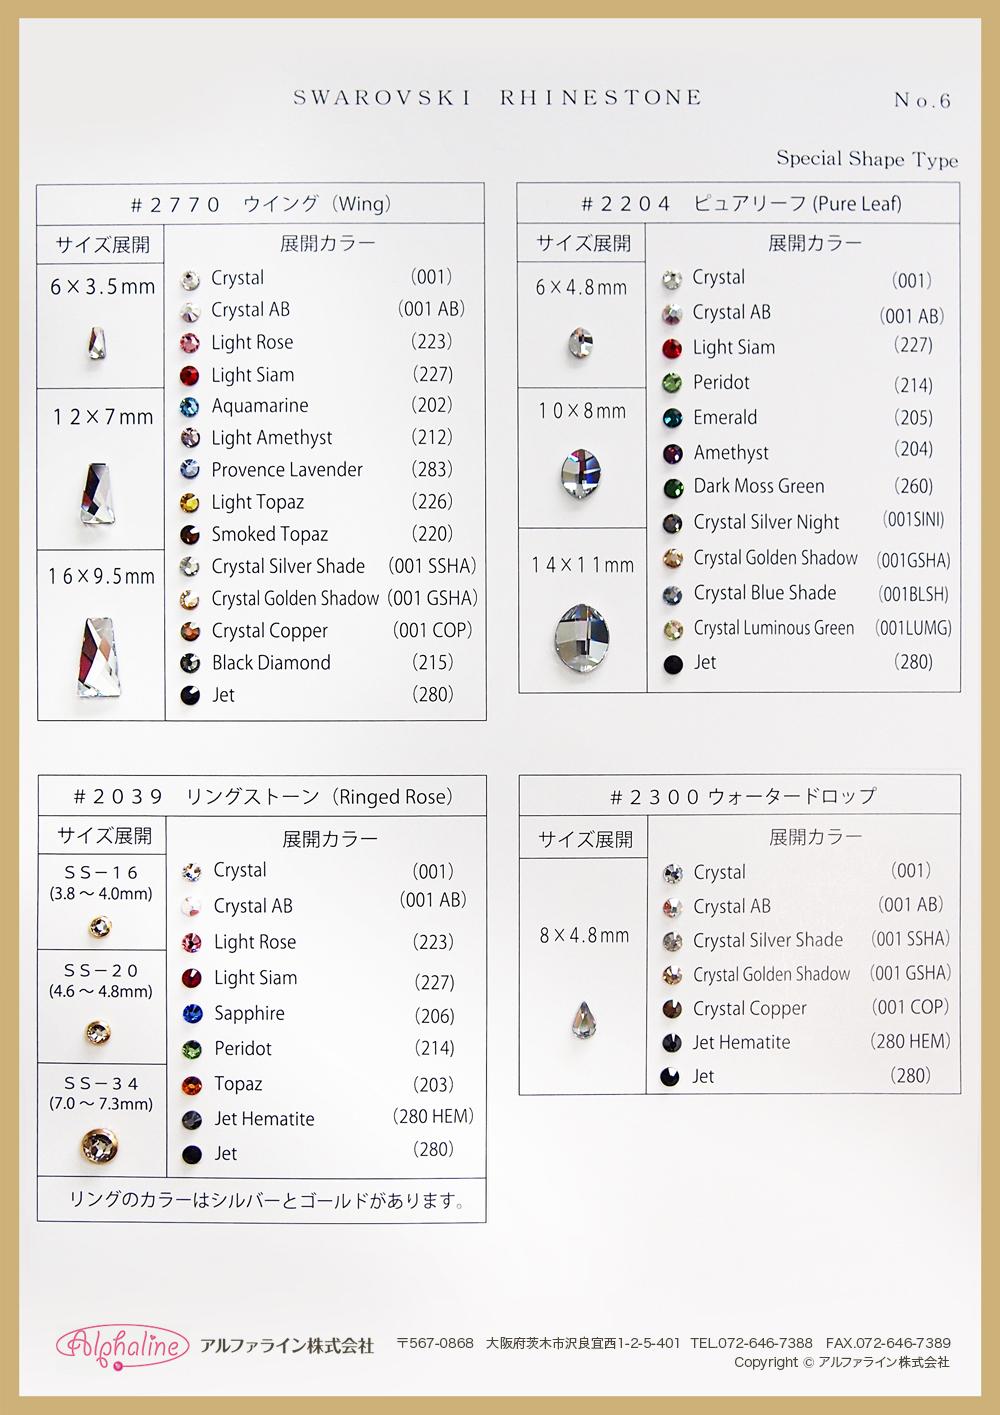 No.6/ラインストーン 【Round Type】